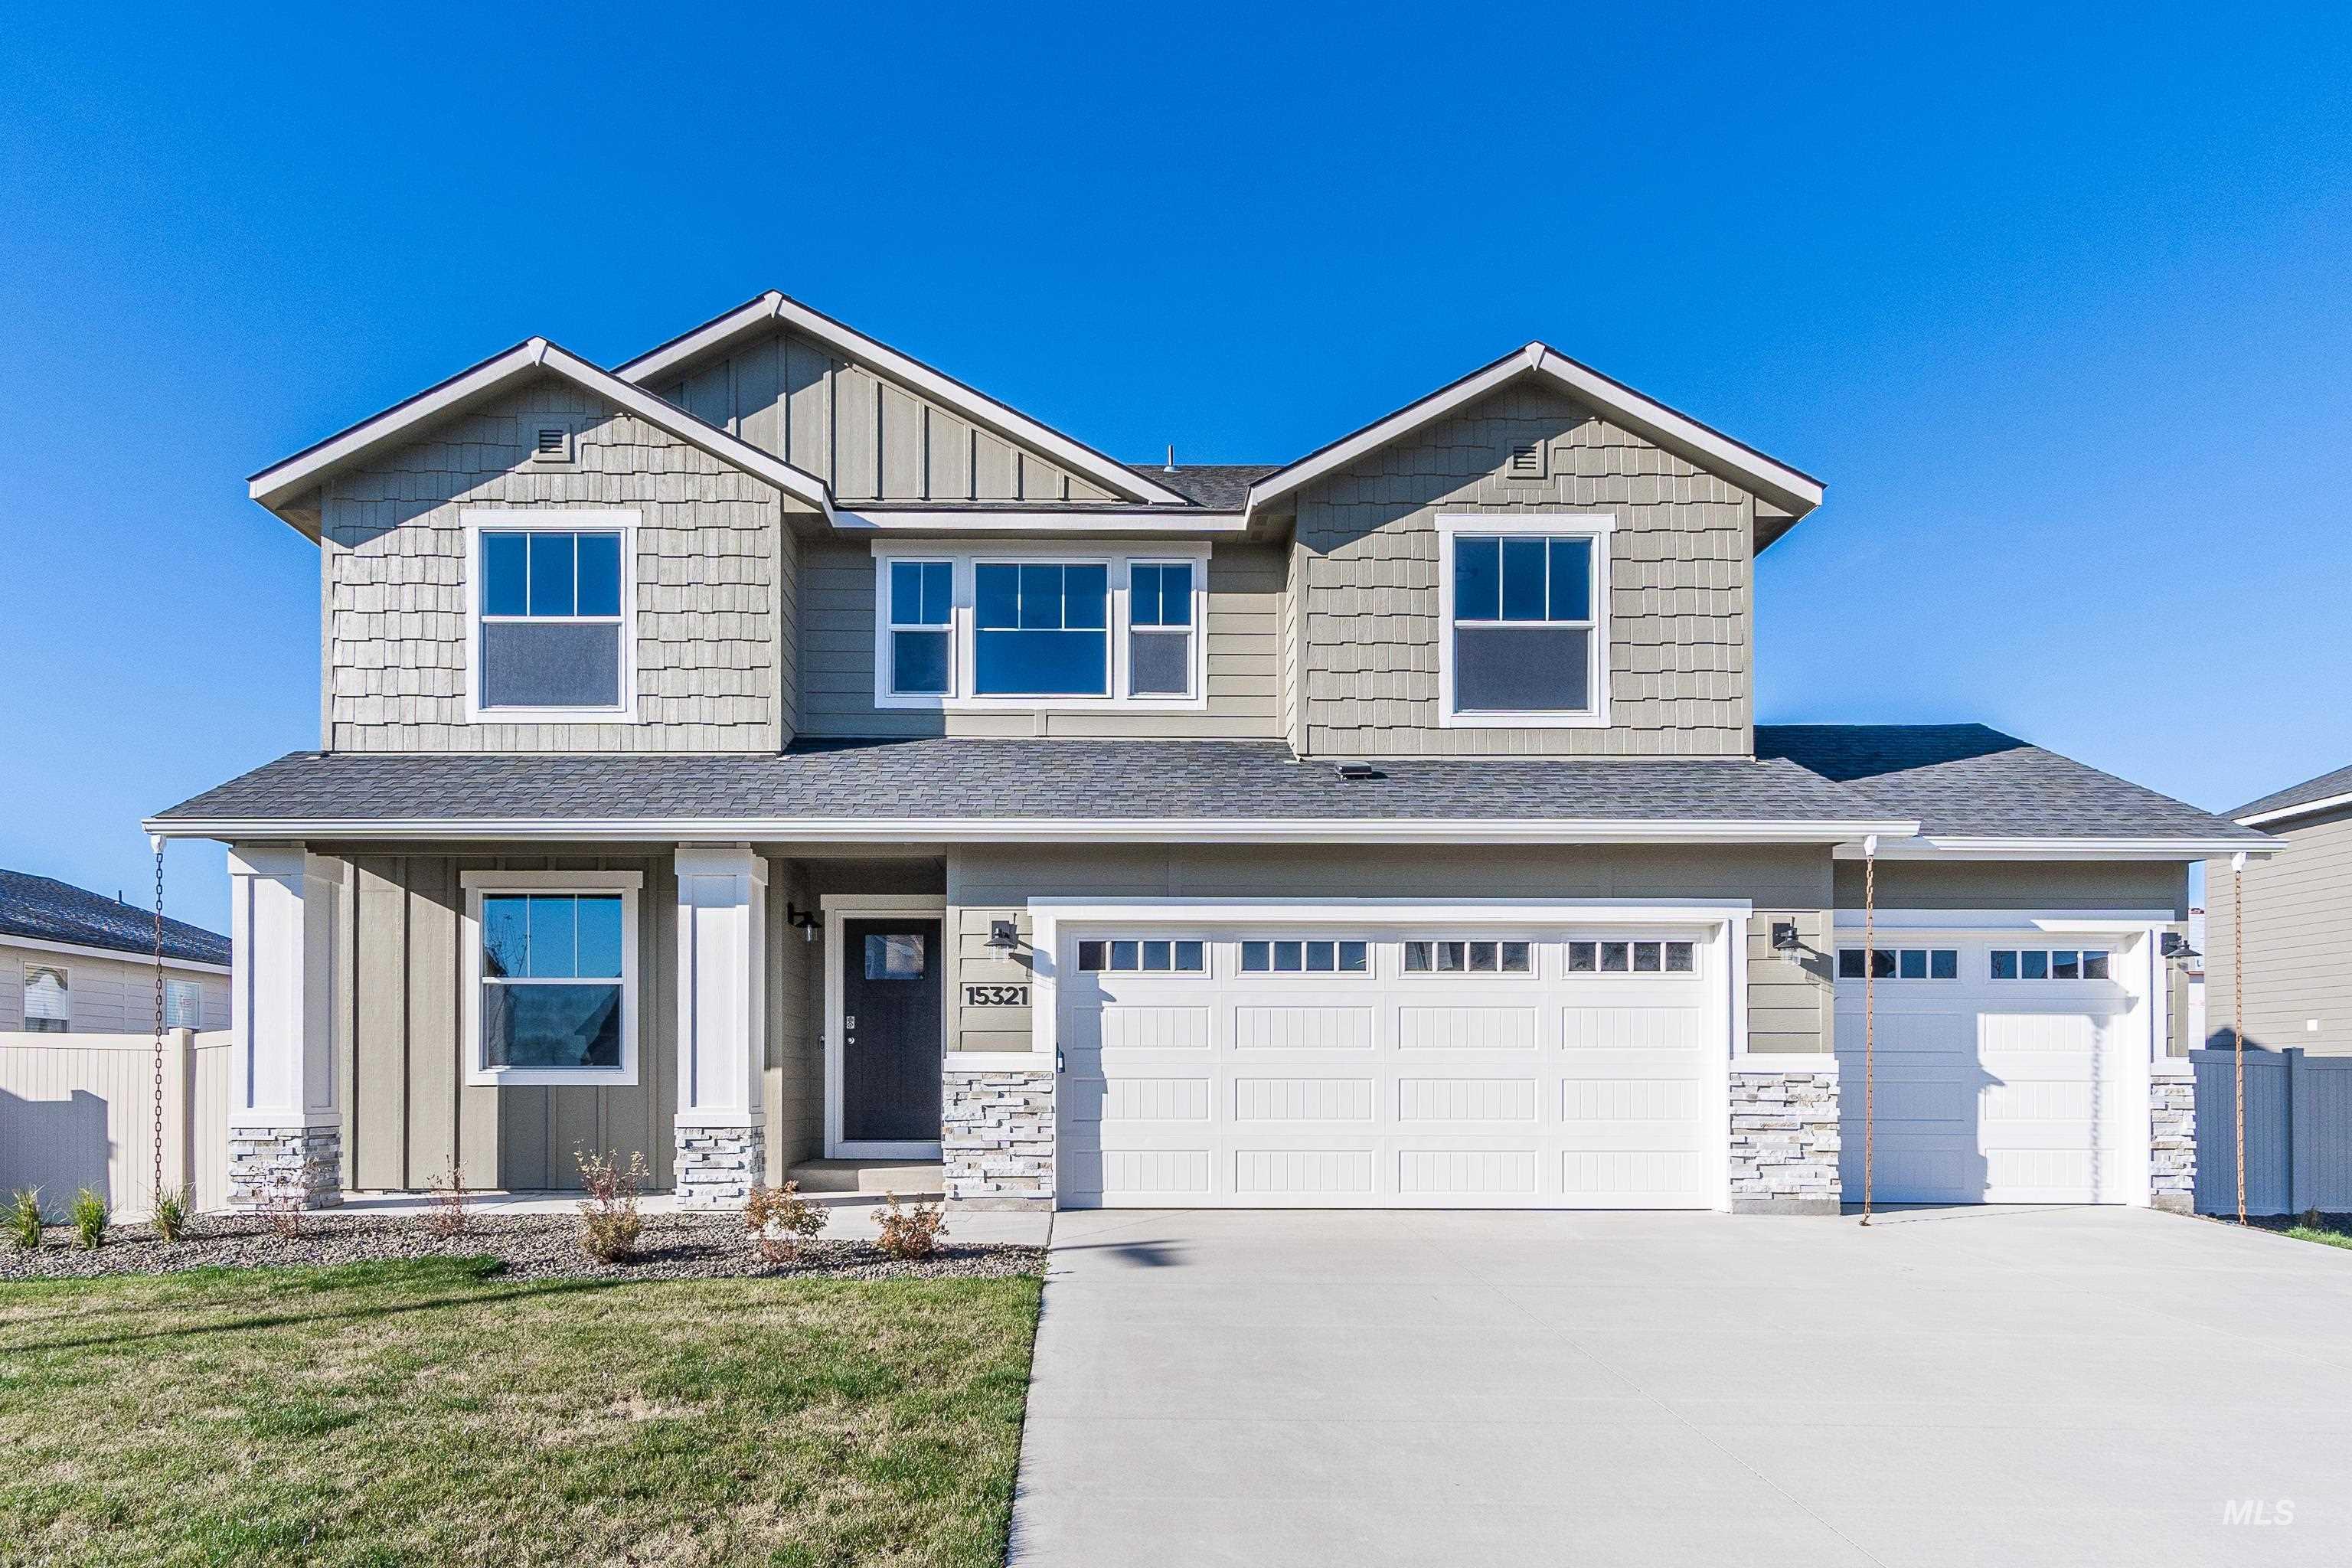 15321 Stovall Ave Property Photo